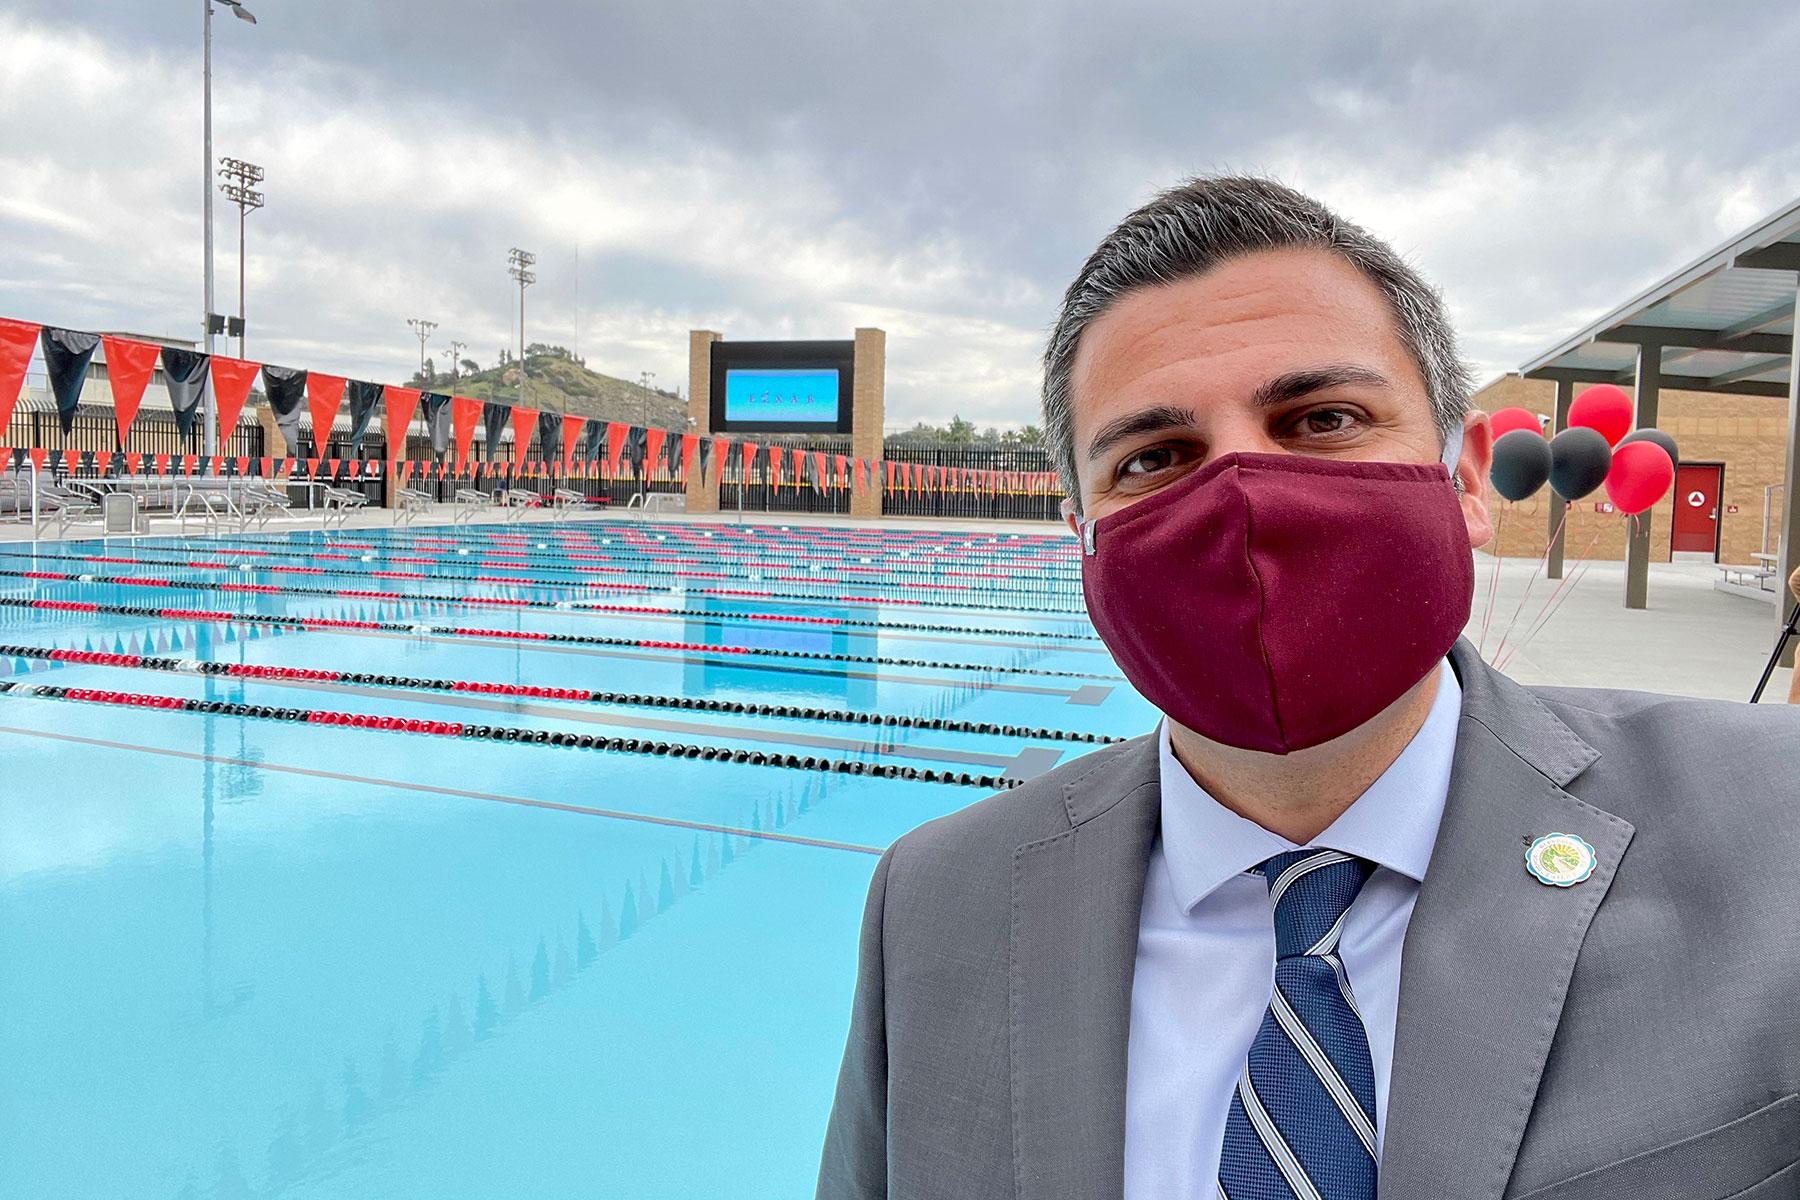 Glendale High School Aquatic Center